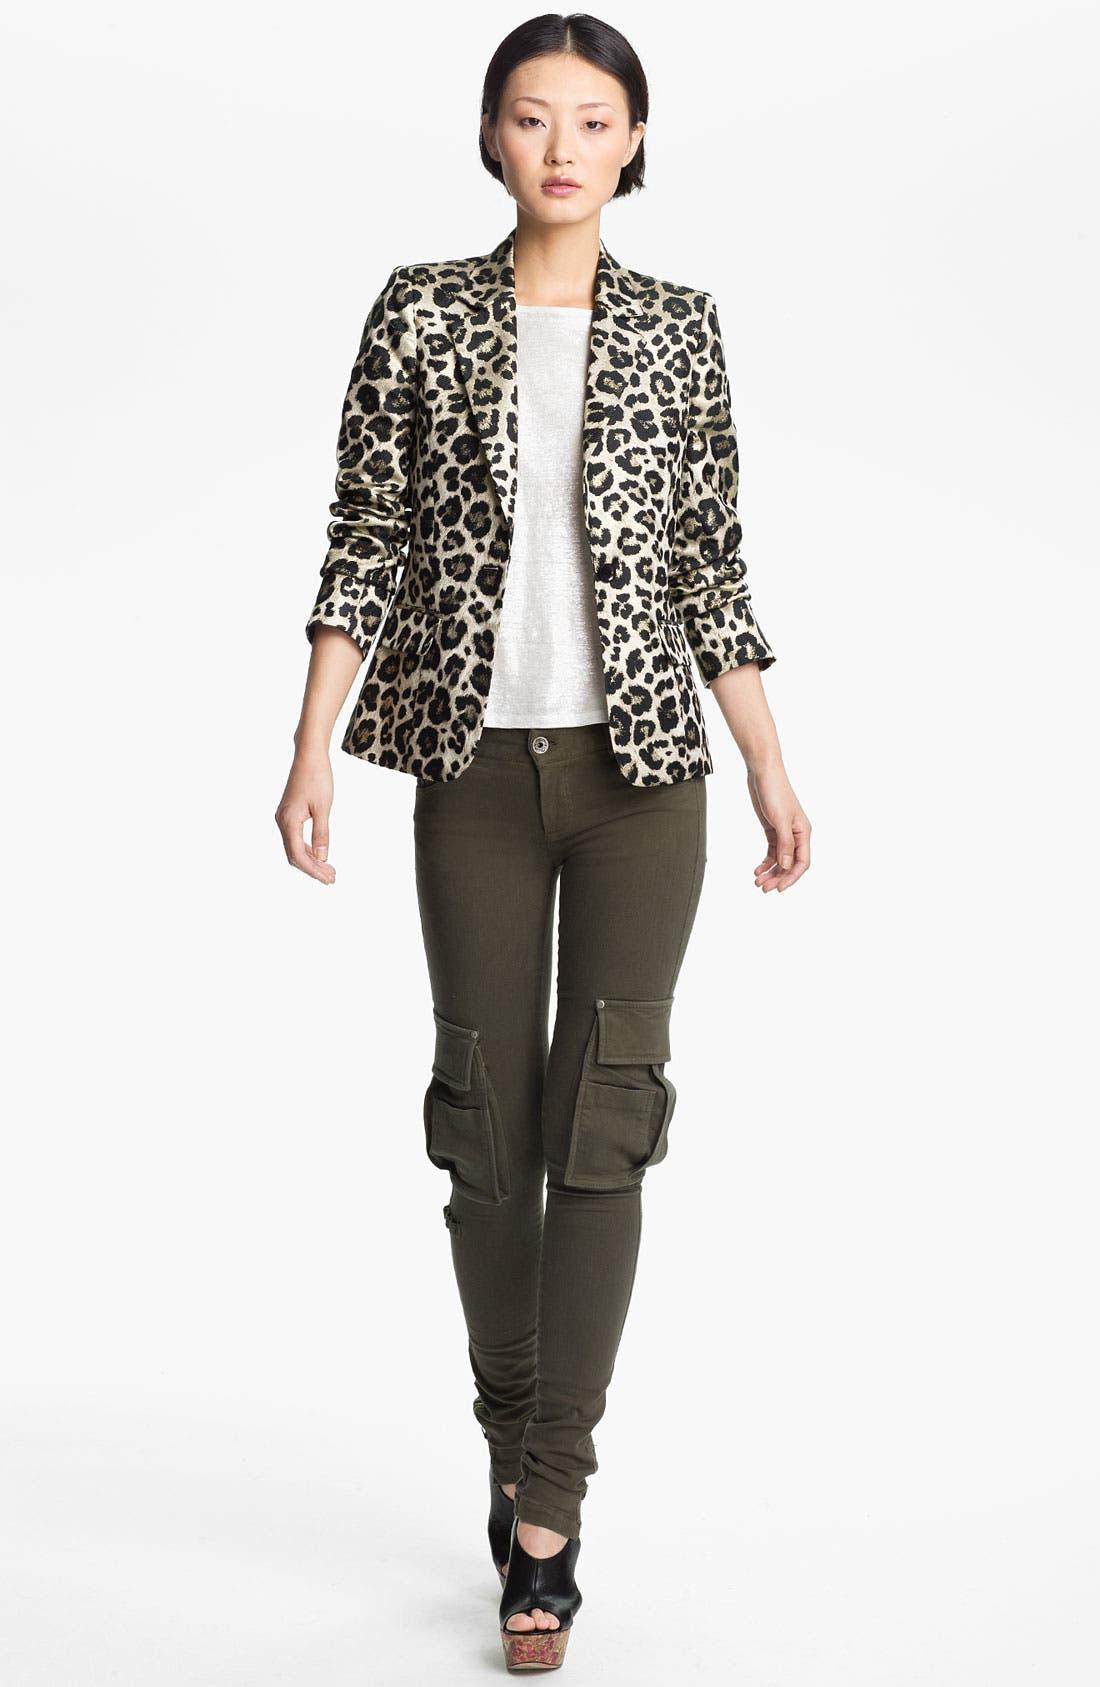 Alternate Image 1 Selected - Alice + Olivia 'Elyse' Leopard Print Blazer